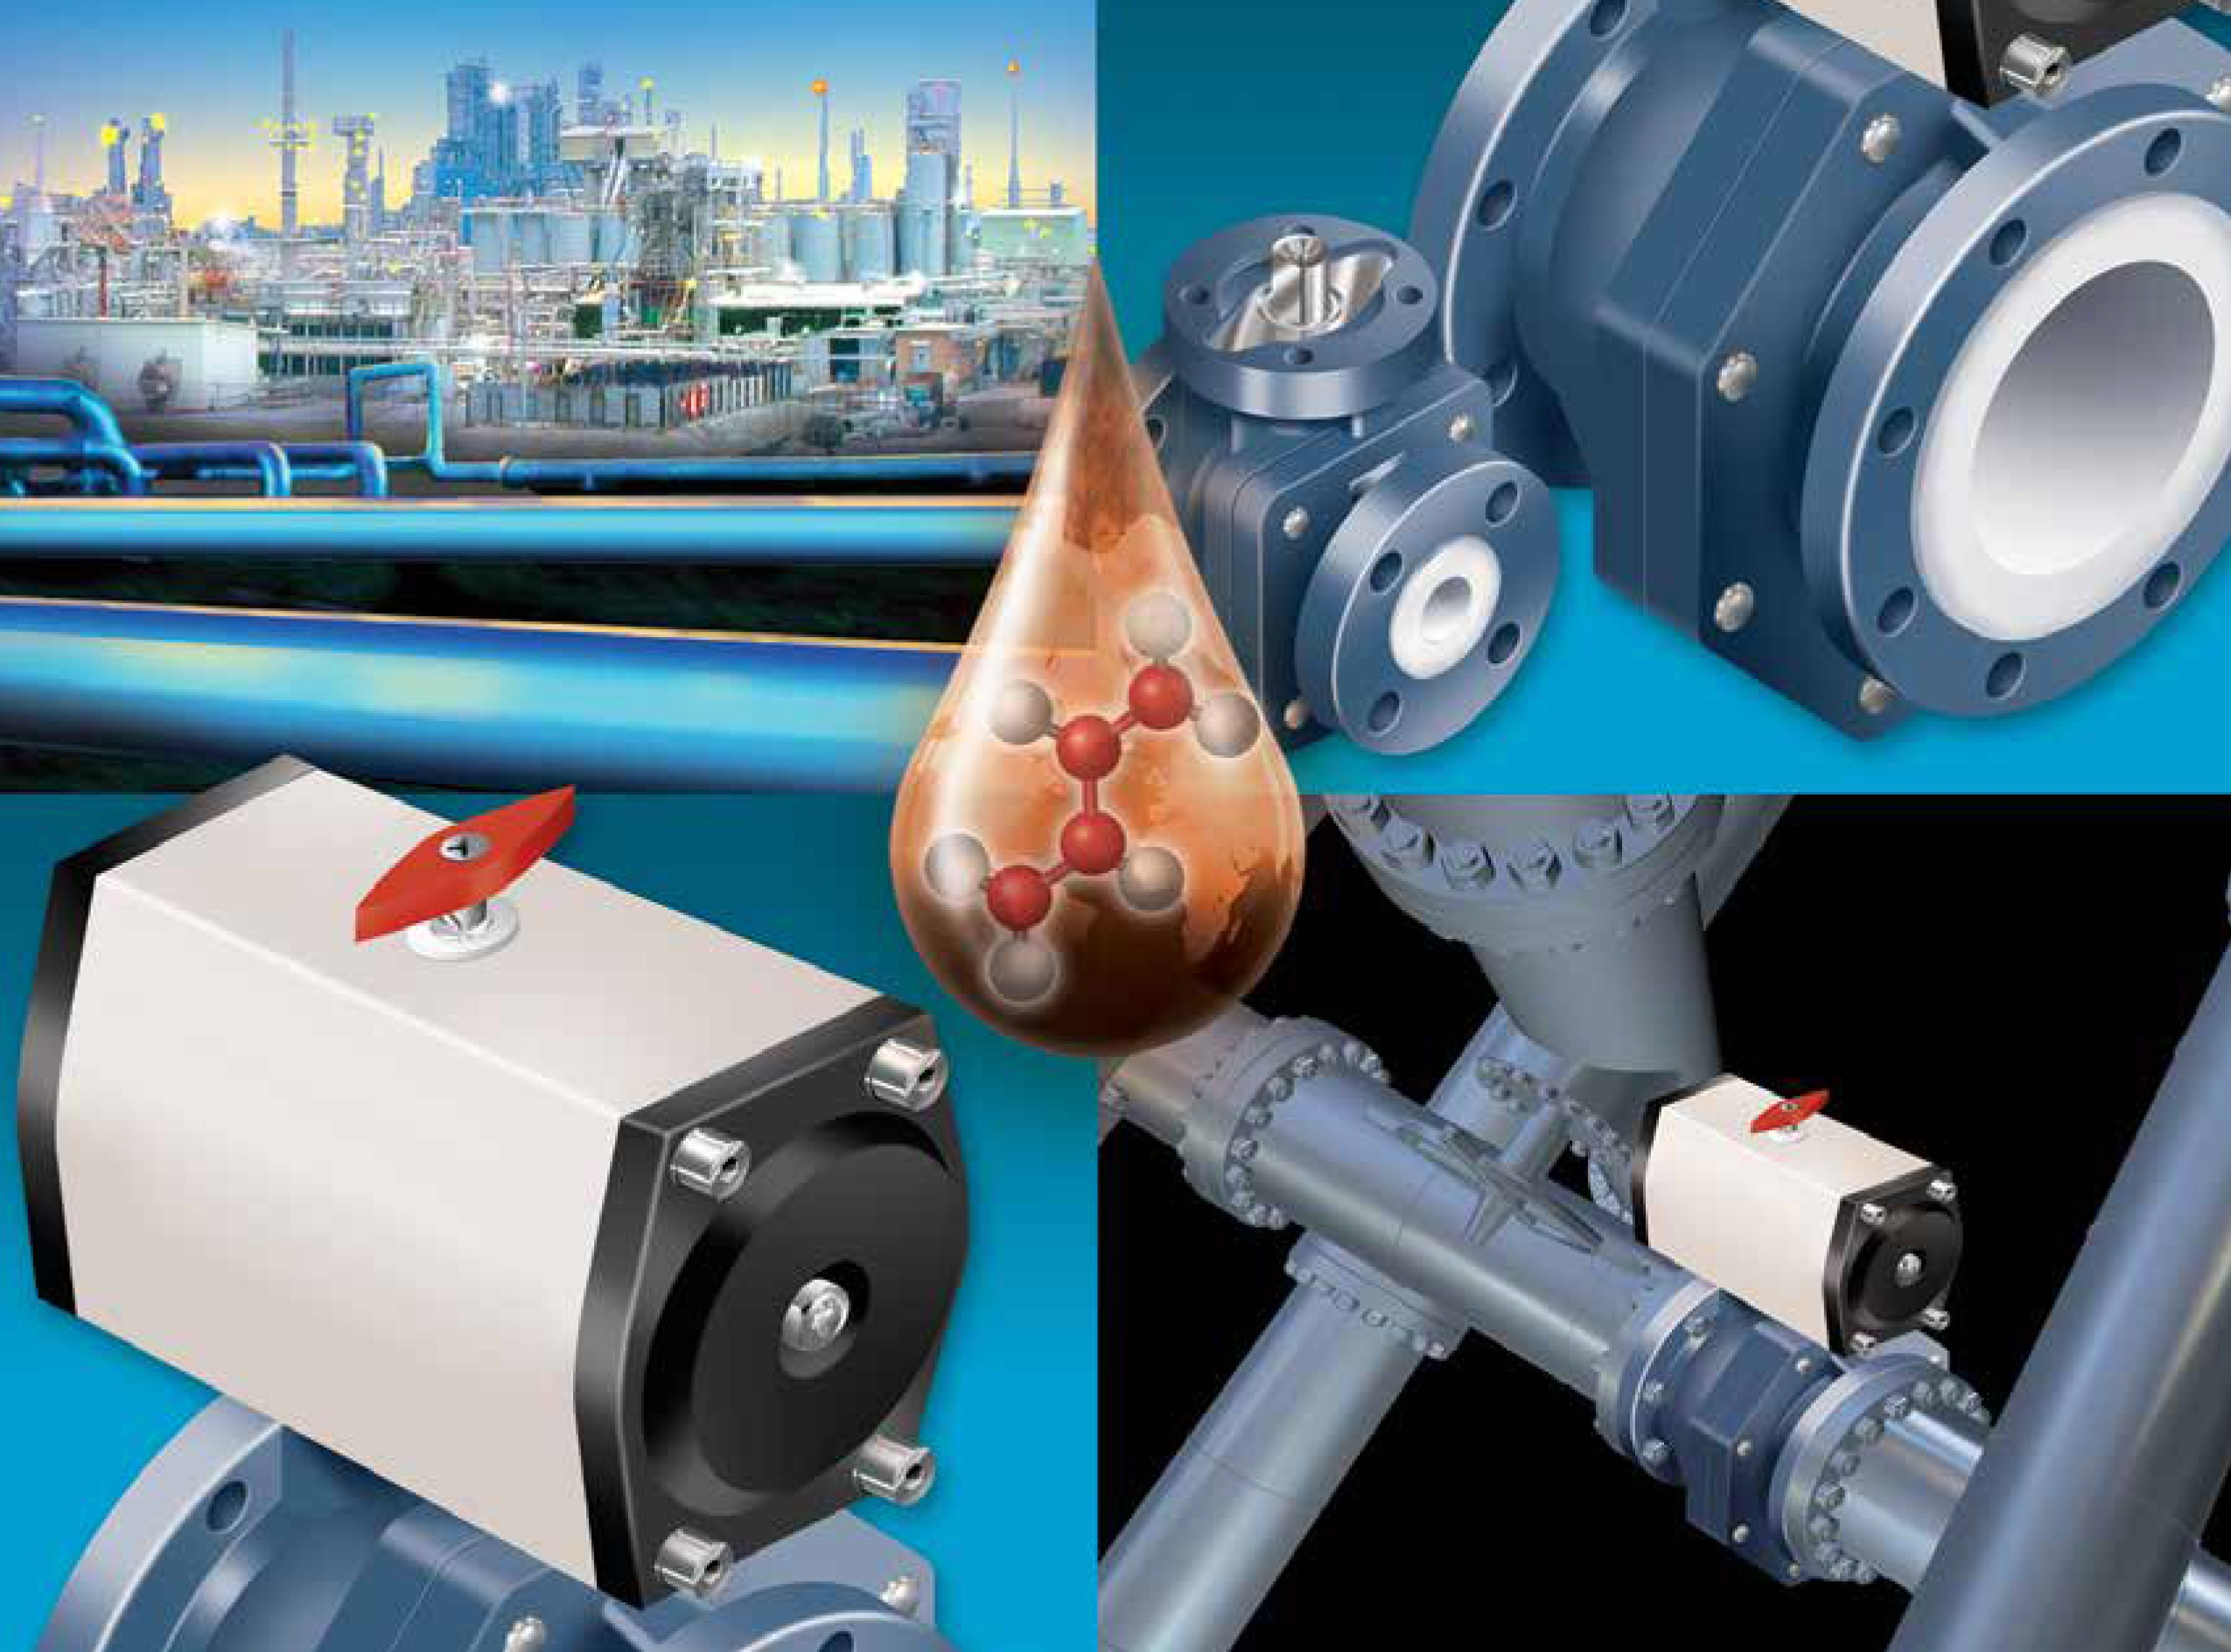 NIBCO Sure Seal Full Port Lined Ball Valves